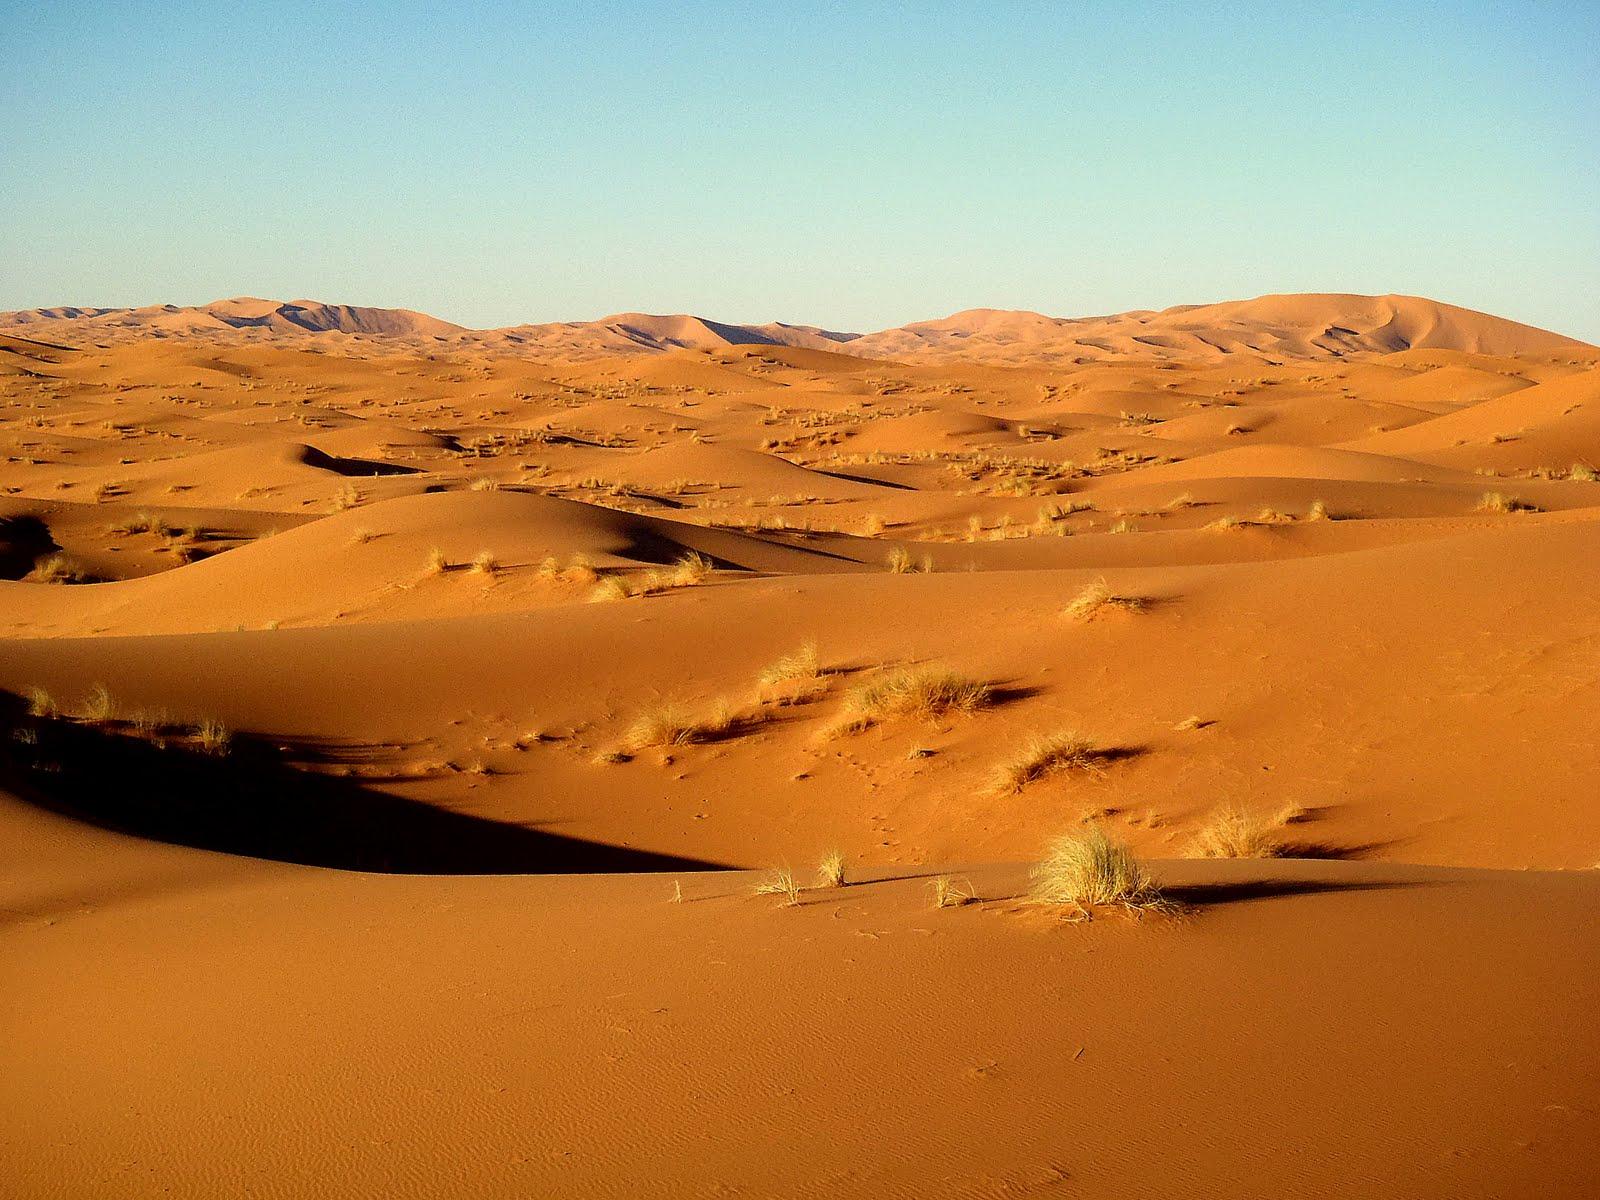 Sahara clipart saudi arabia #7